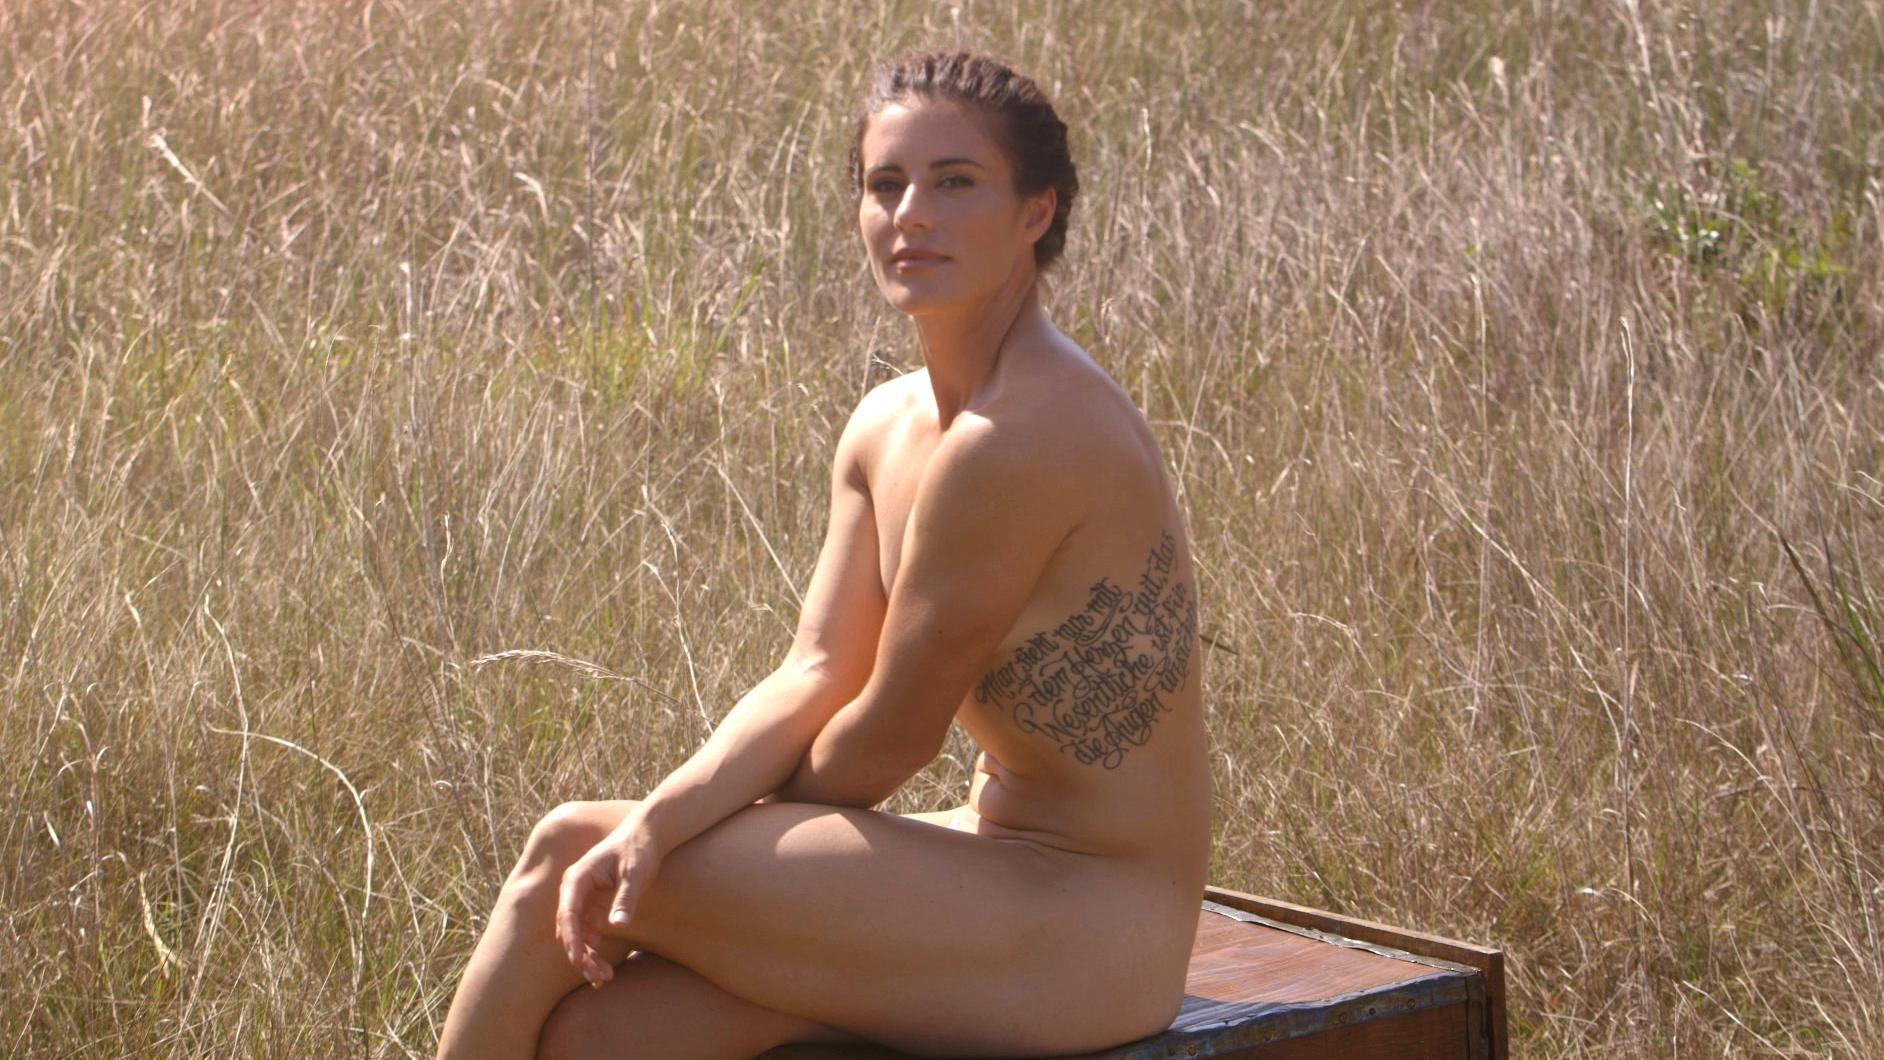 espn body issue women 2017 - photo #14